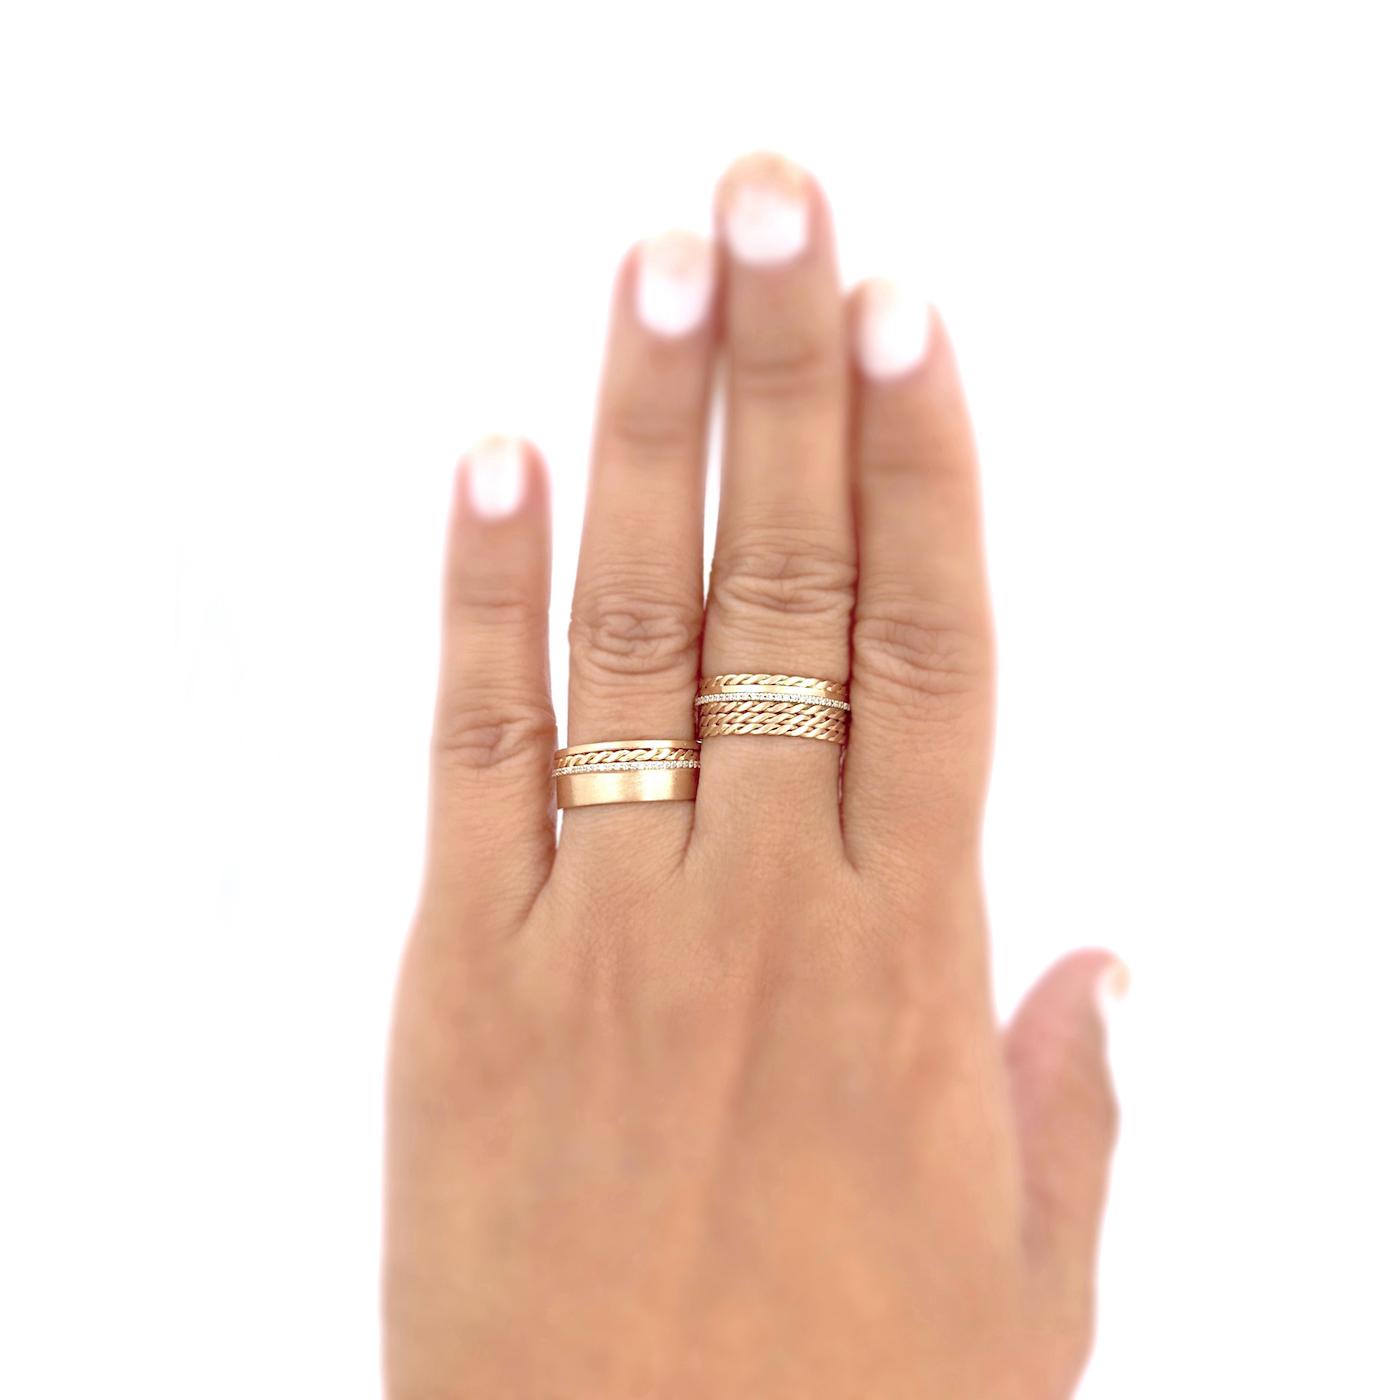 18k-gold-twist-mesh-textured-pave-diamond-cigar-band-EFCR-02-03